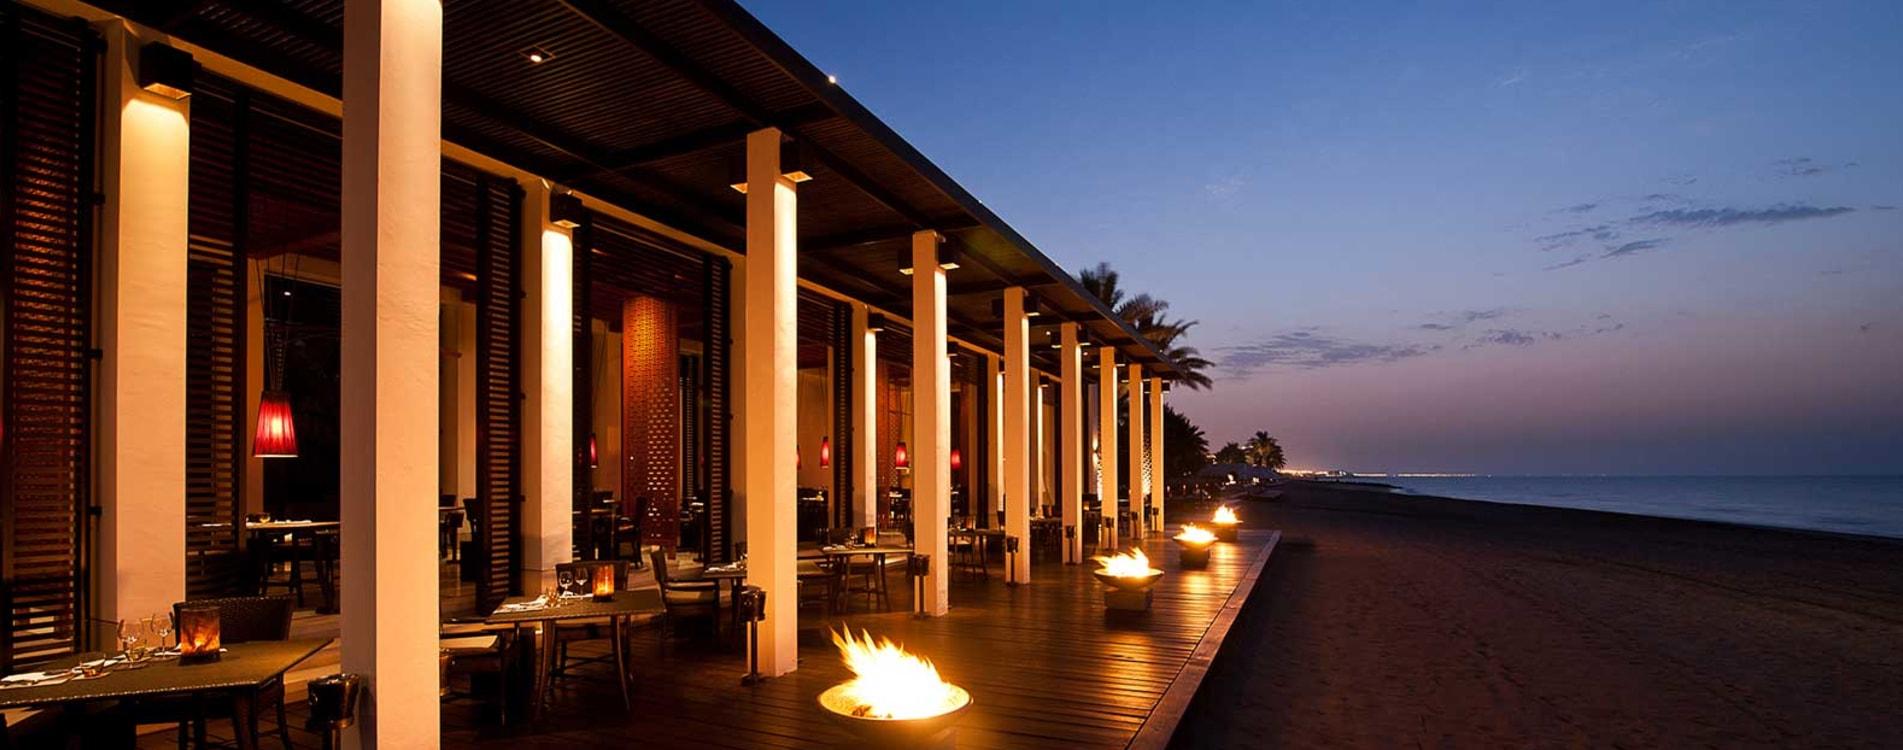 Chedi-Muscat-Dining-Beach-Restaurant-Exterior.jpg